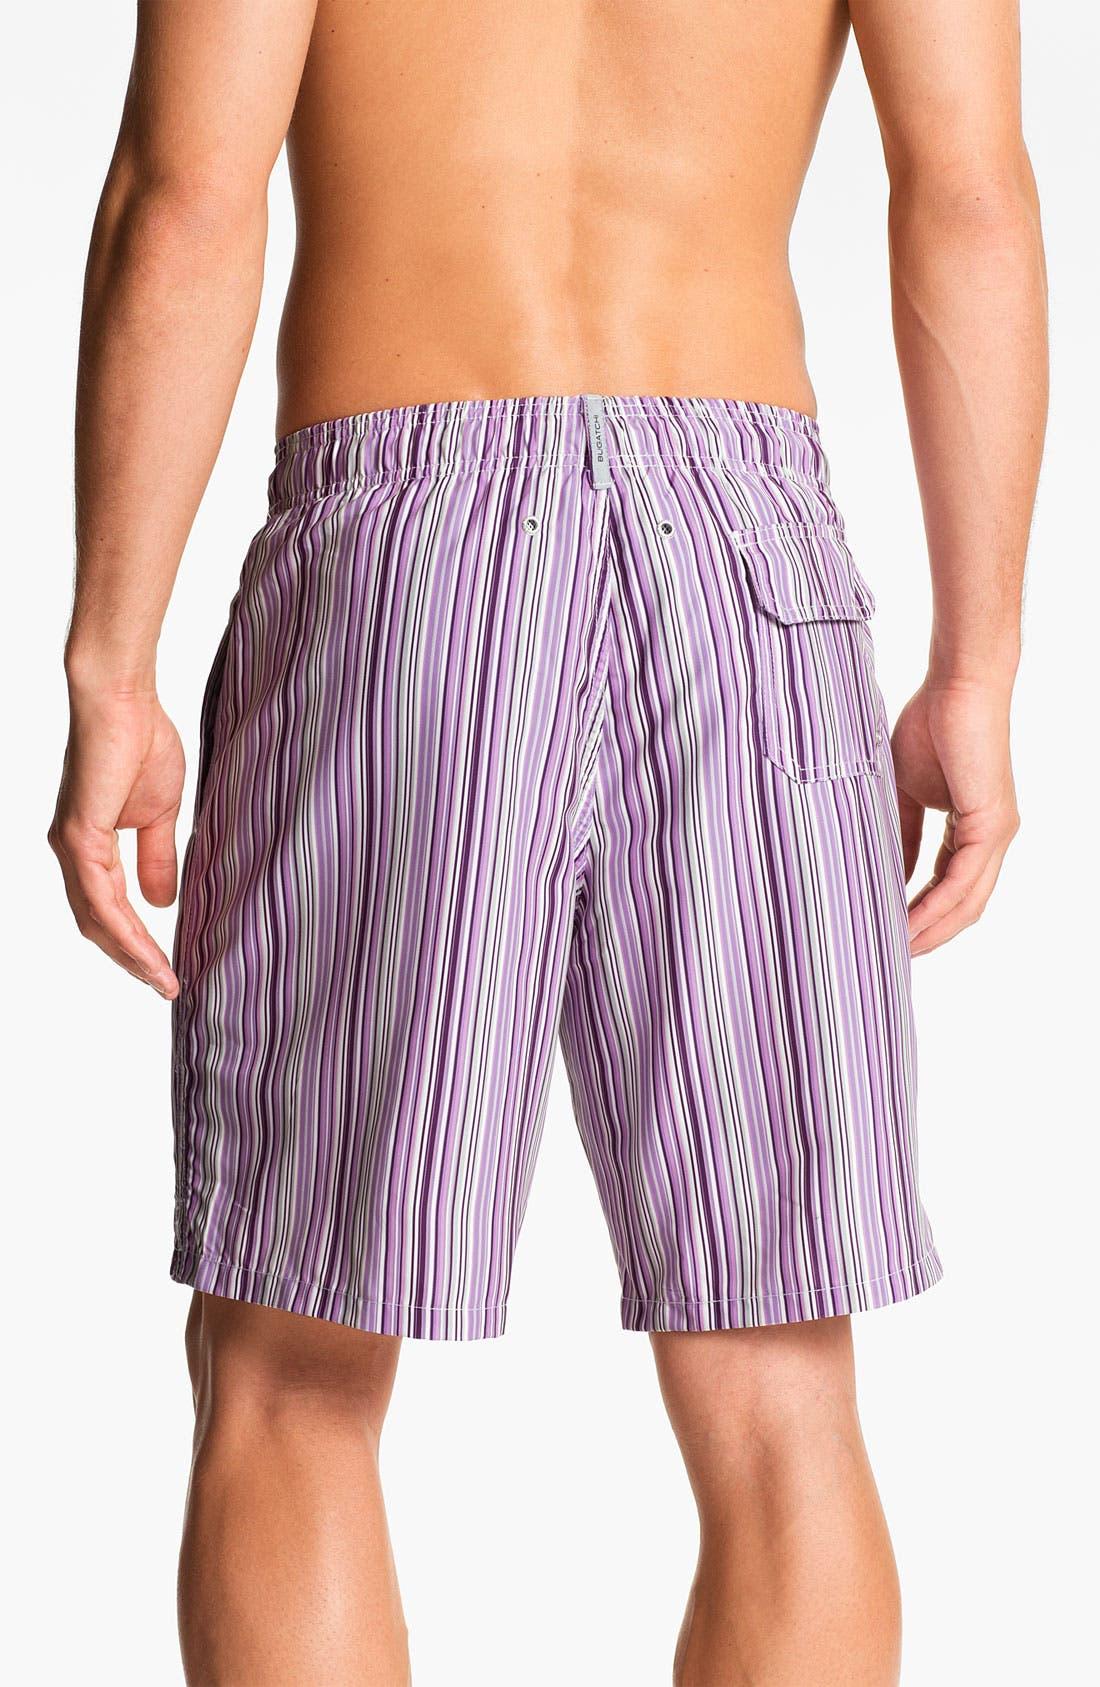 Alternate Image 2  - Bugatchi Uomo Stripe Board Shorts